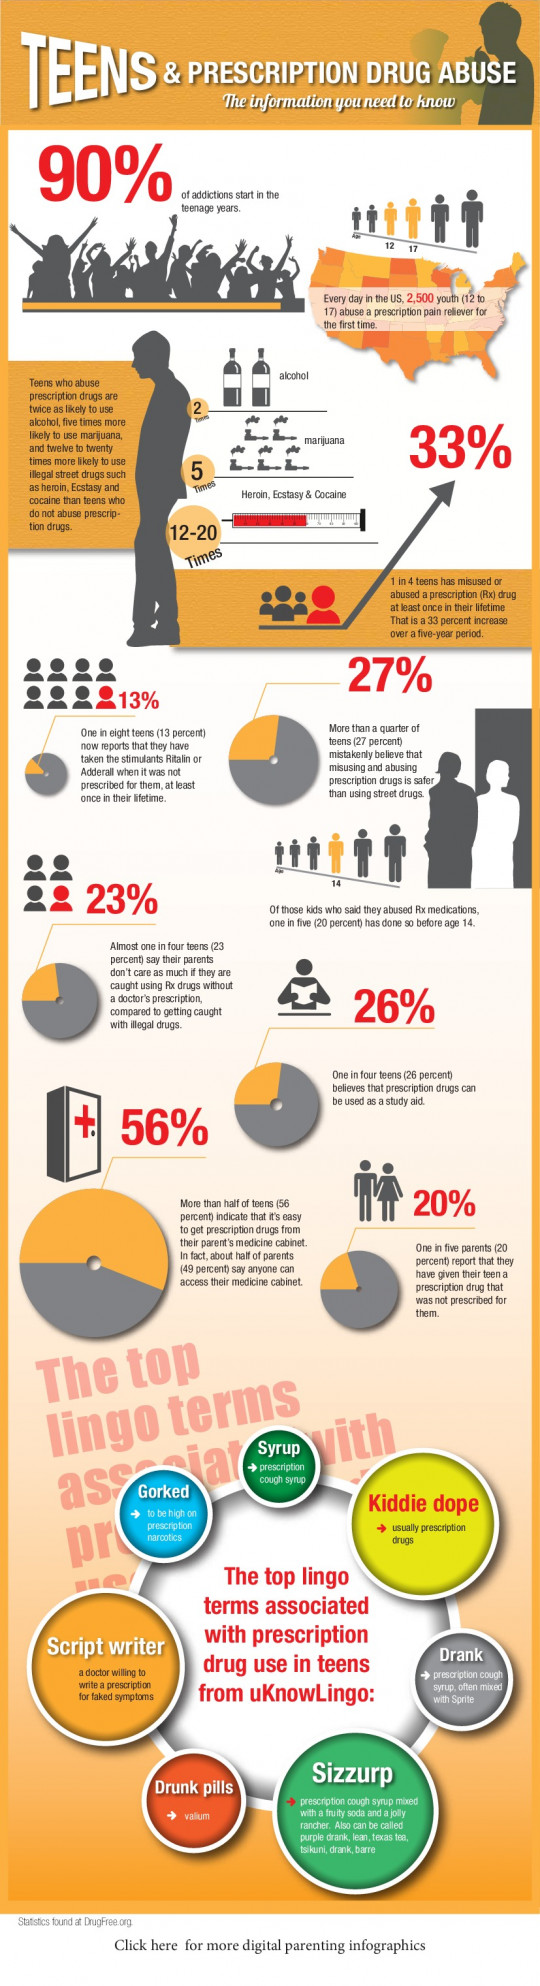 Teens & Prescription Drug Abuse Infographic